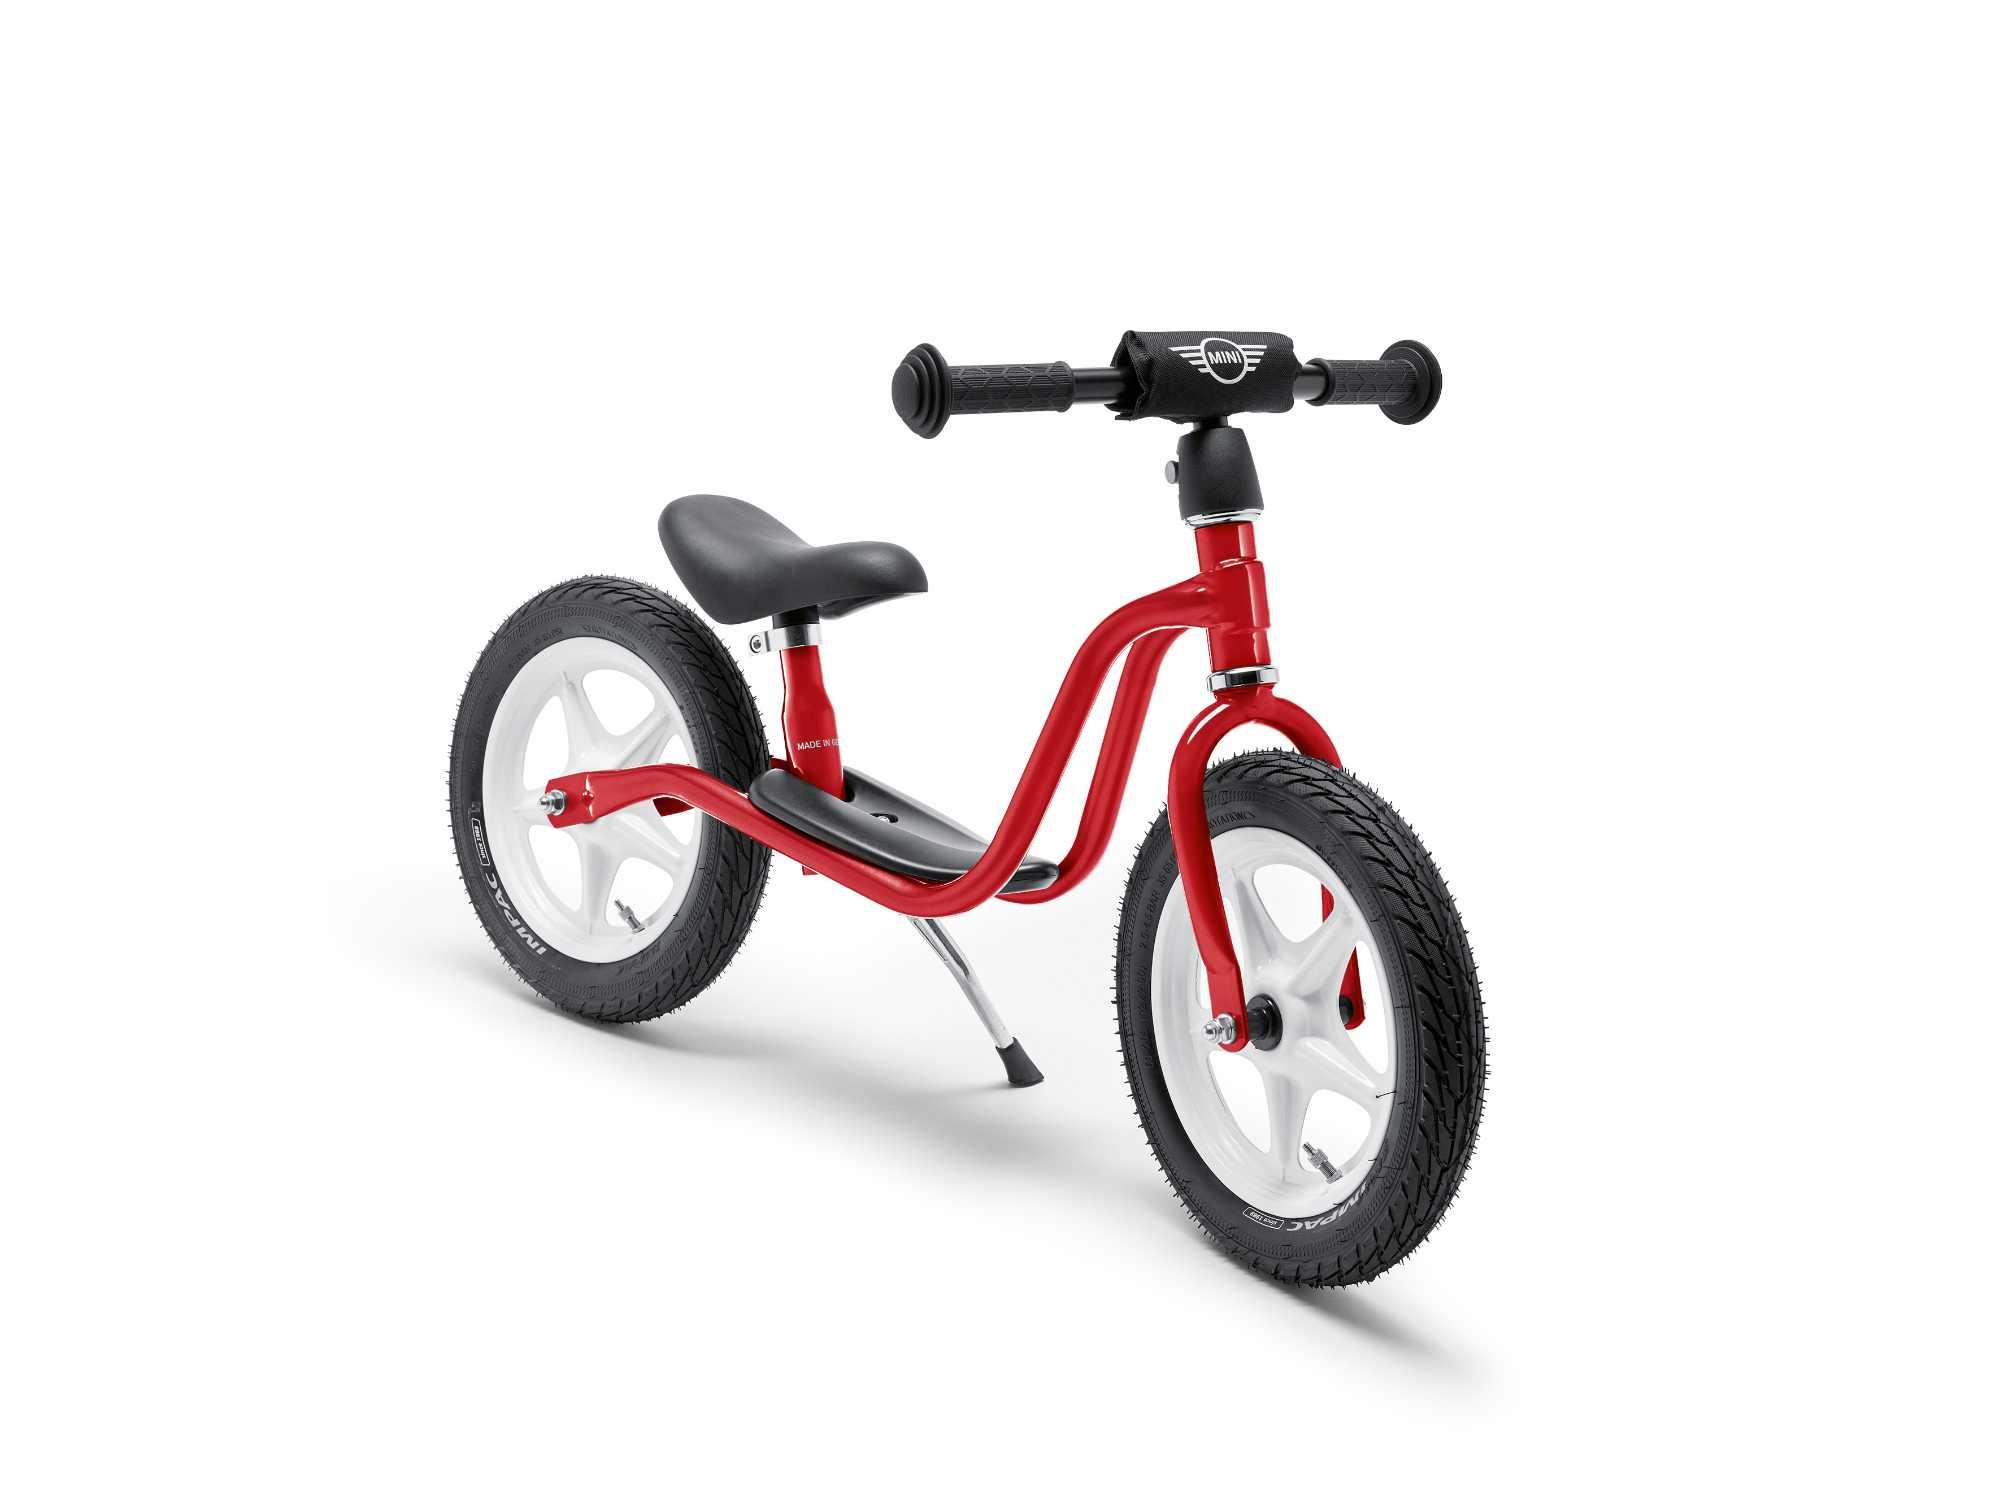 MINI Lifestyle Collection 2018–2020. MINI Balance Bike. (07/2018)